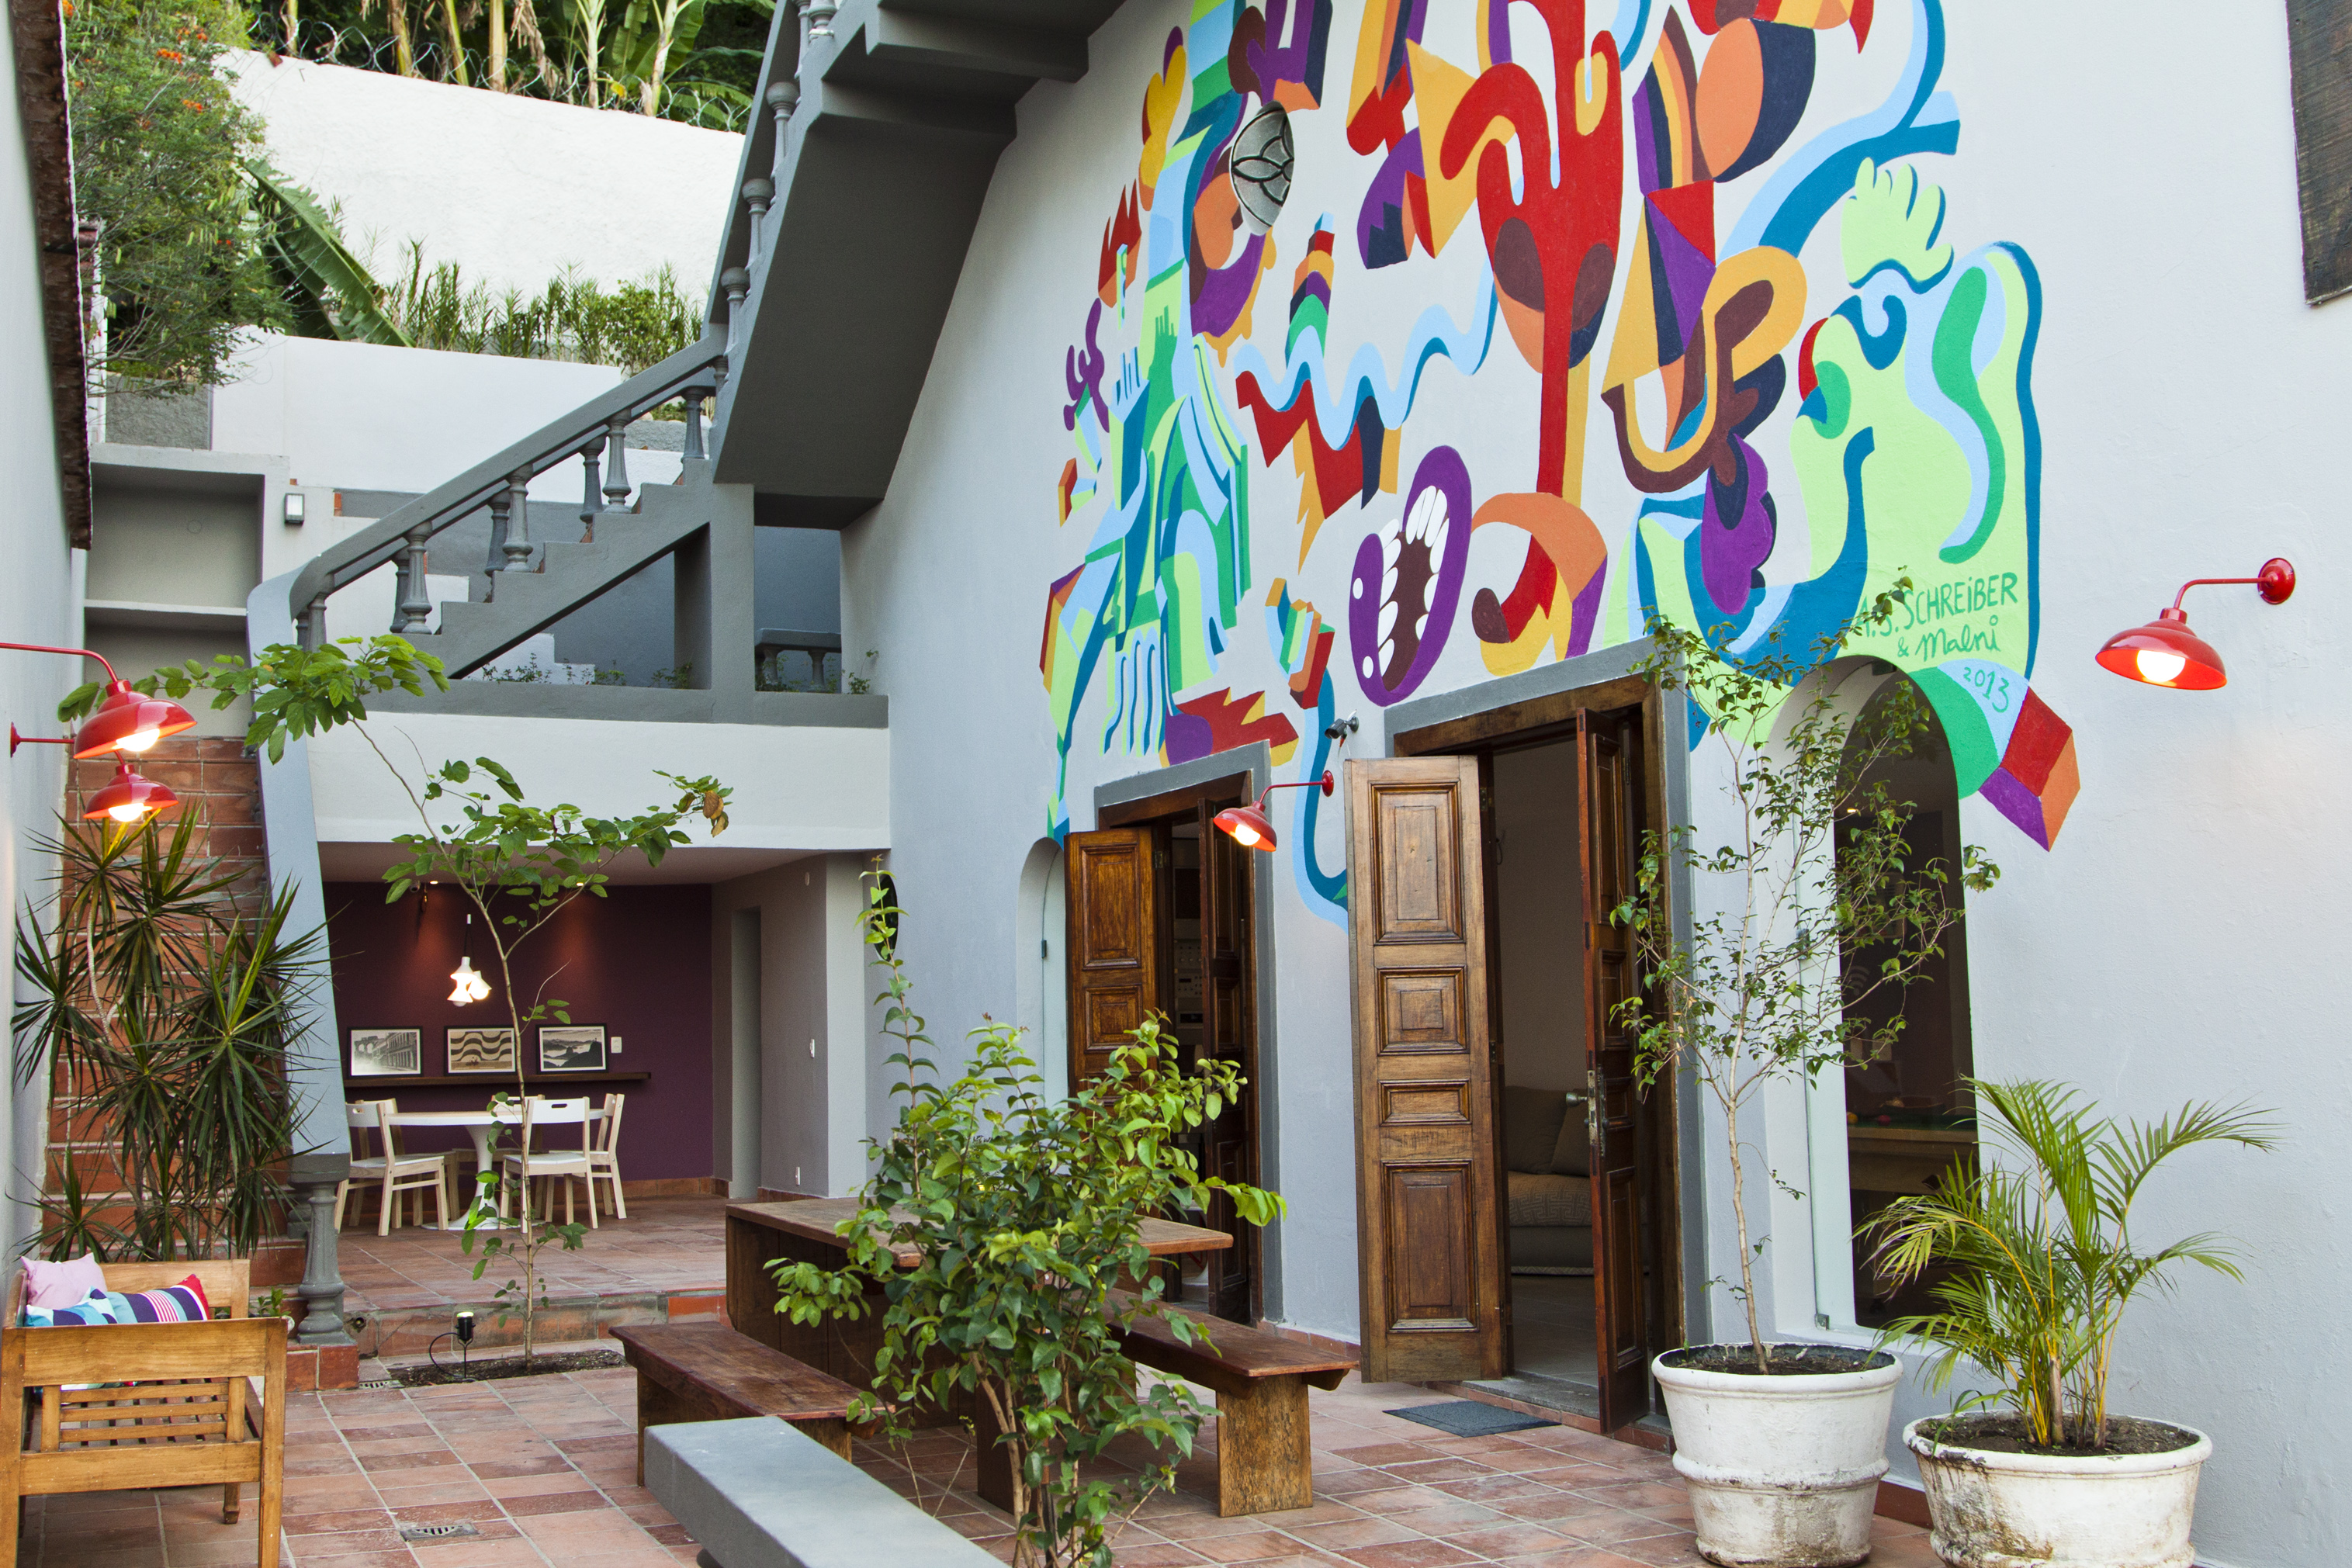 Santa Tere Hostel